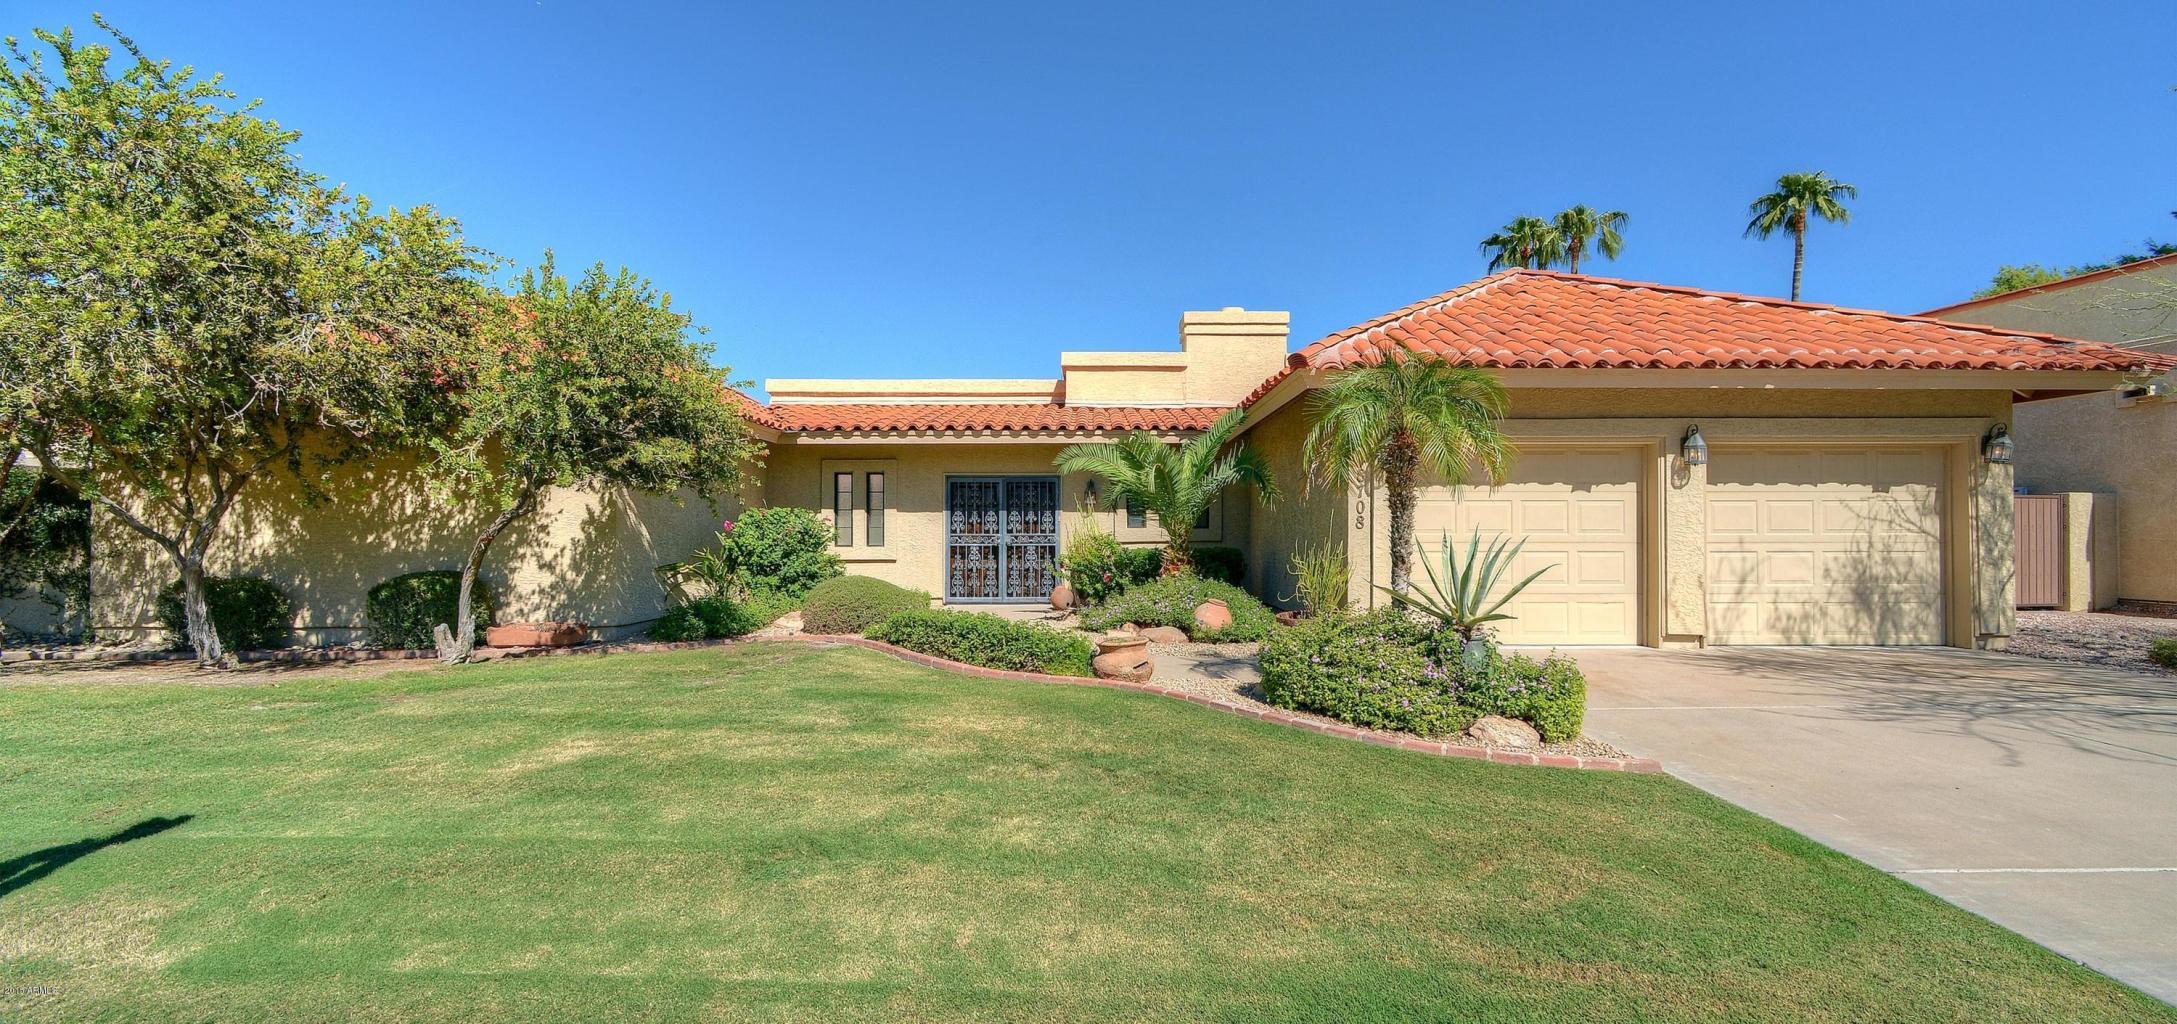 8708 E San Victor Dr, Scottsdale | $597,627